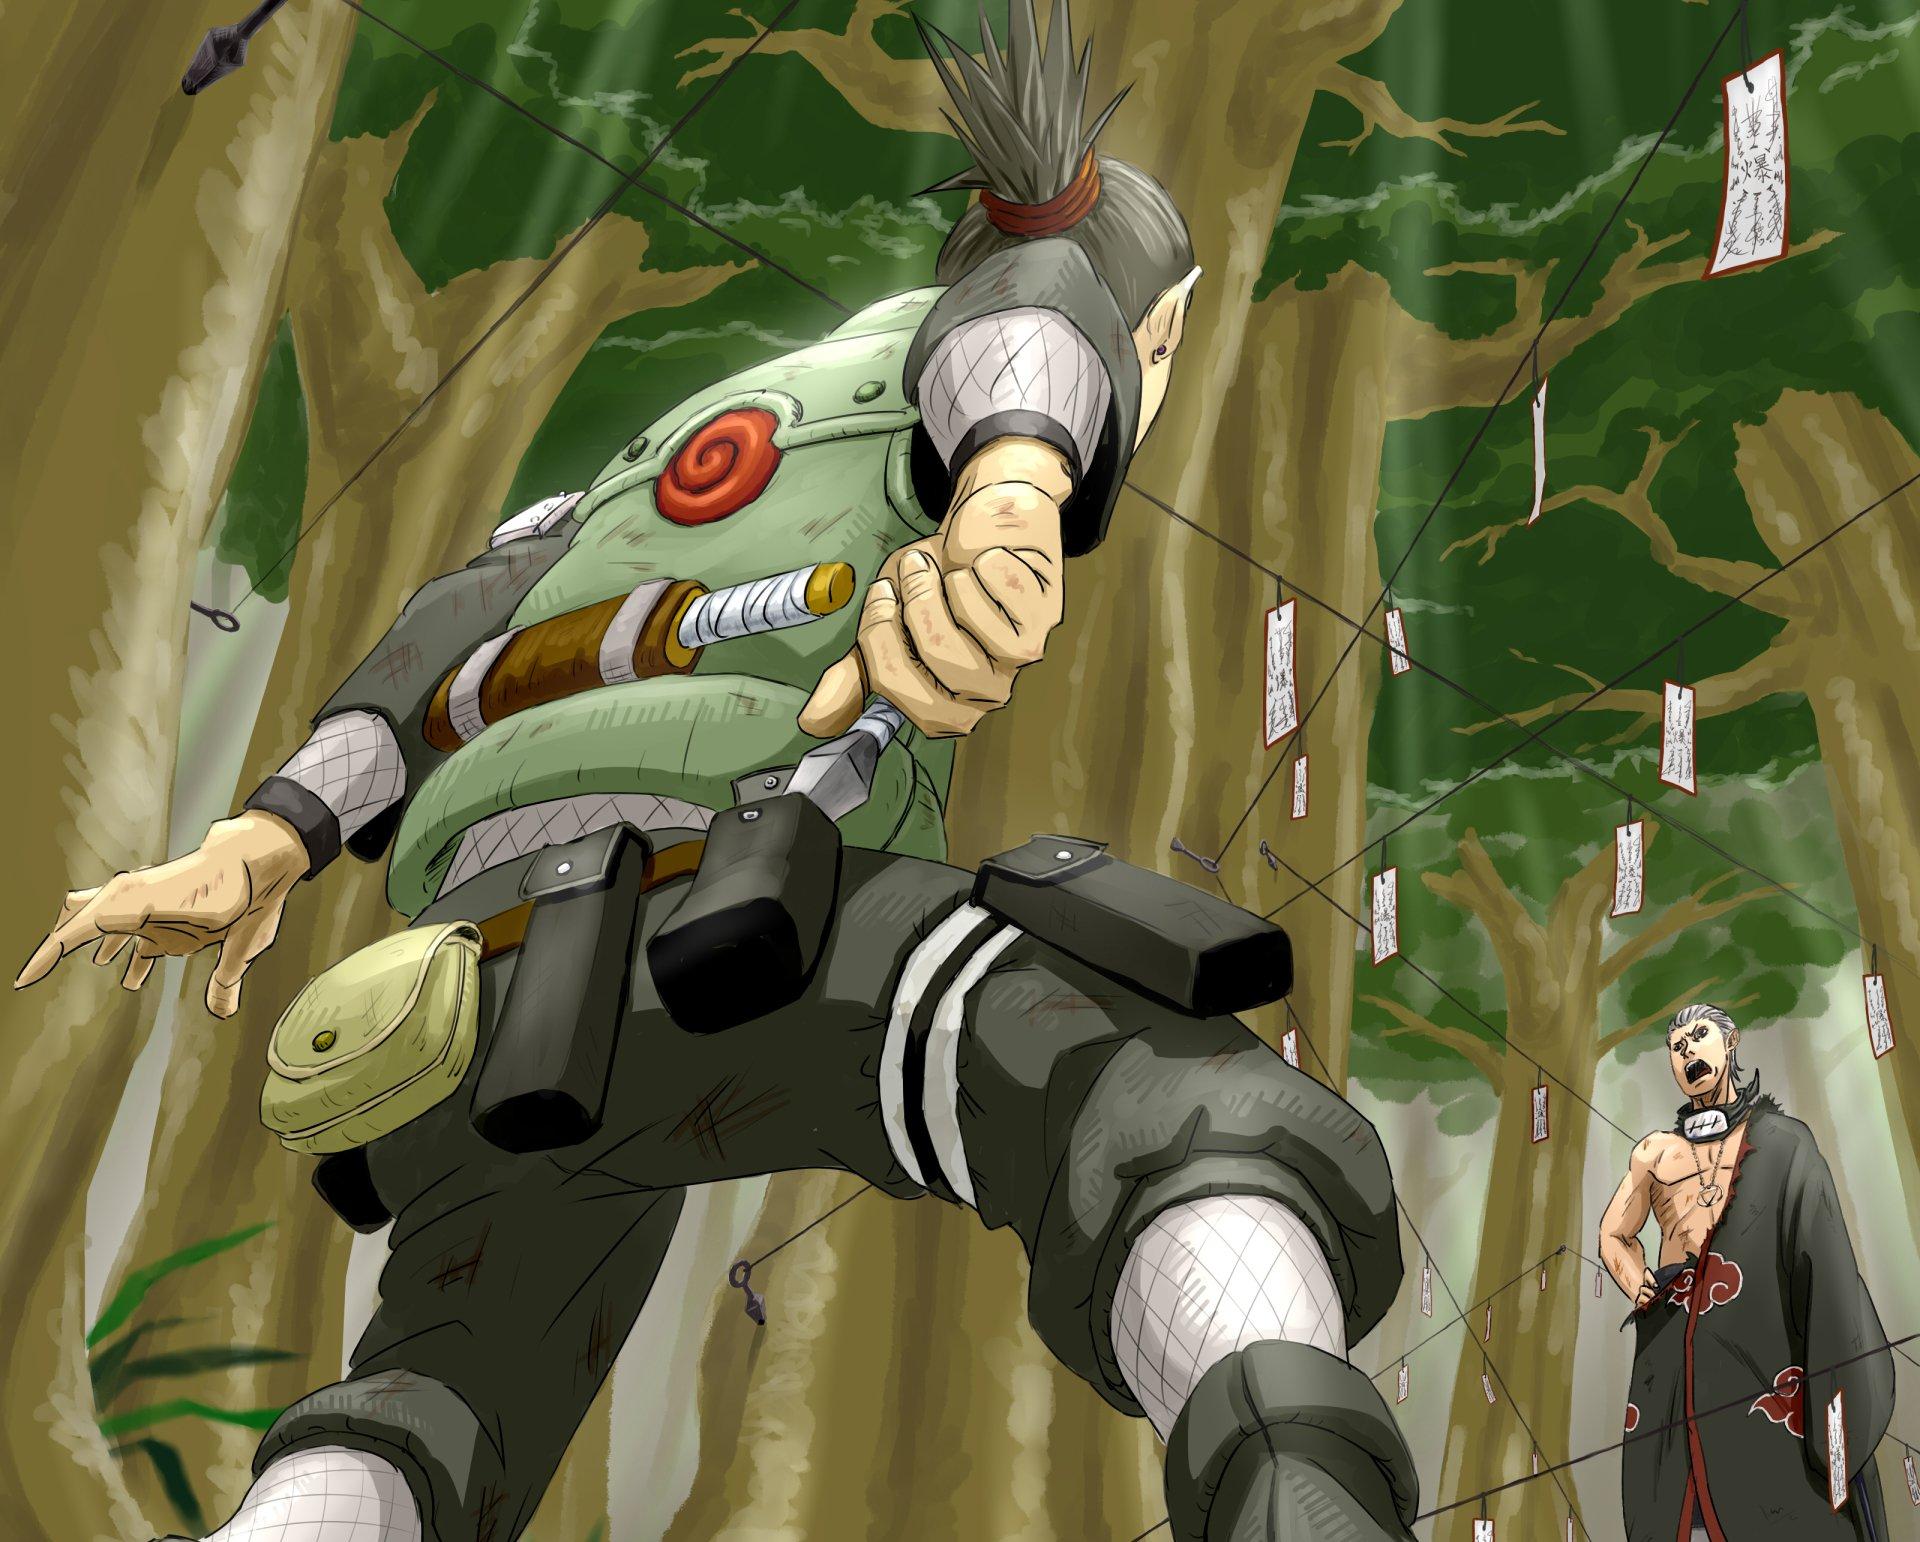 Naruto Fond d'écran HD | Arrière-Plan | 3200x2570 | ID:1061018 - Wallpaper Abyss